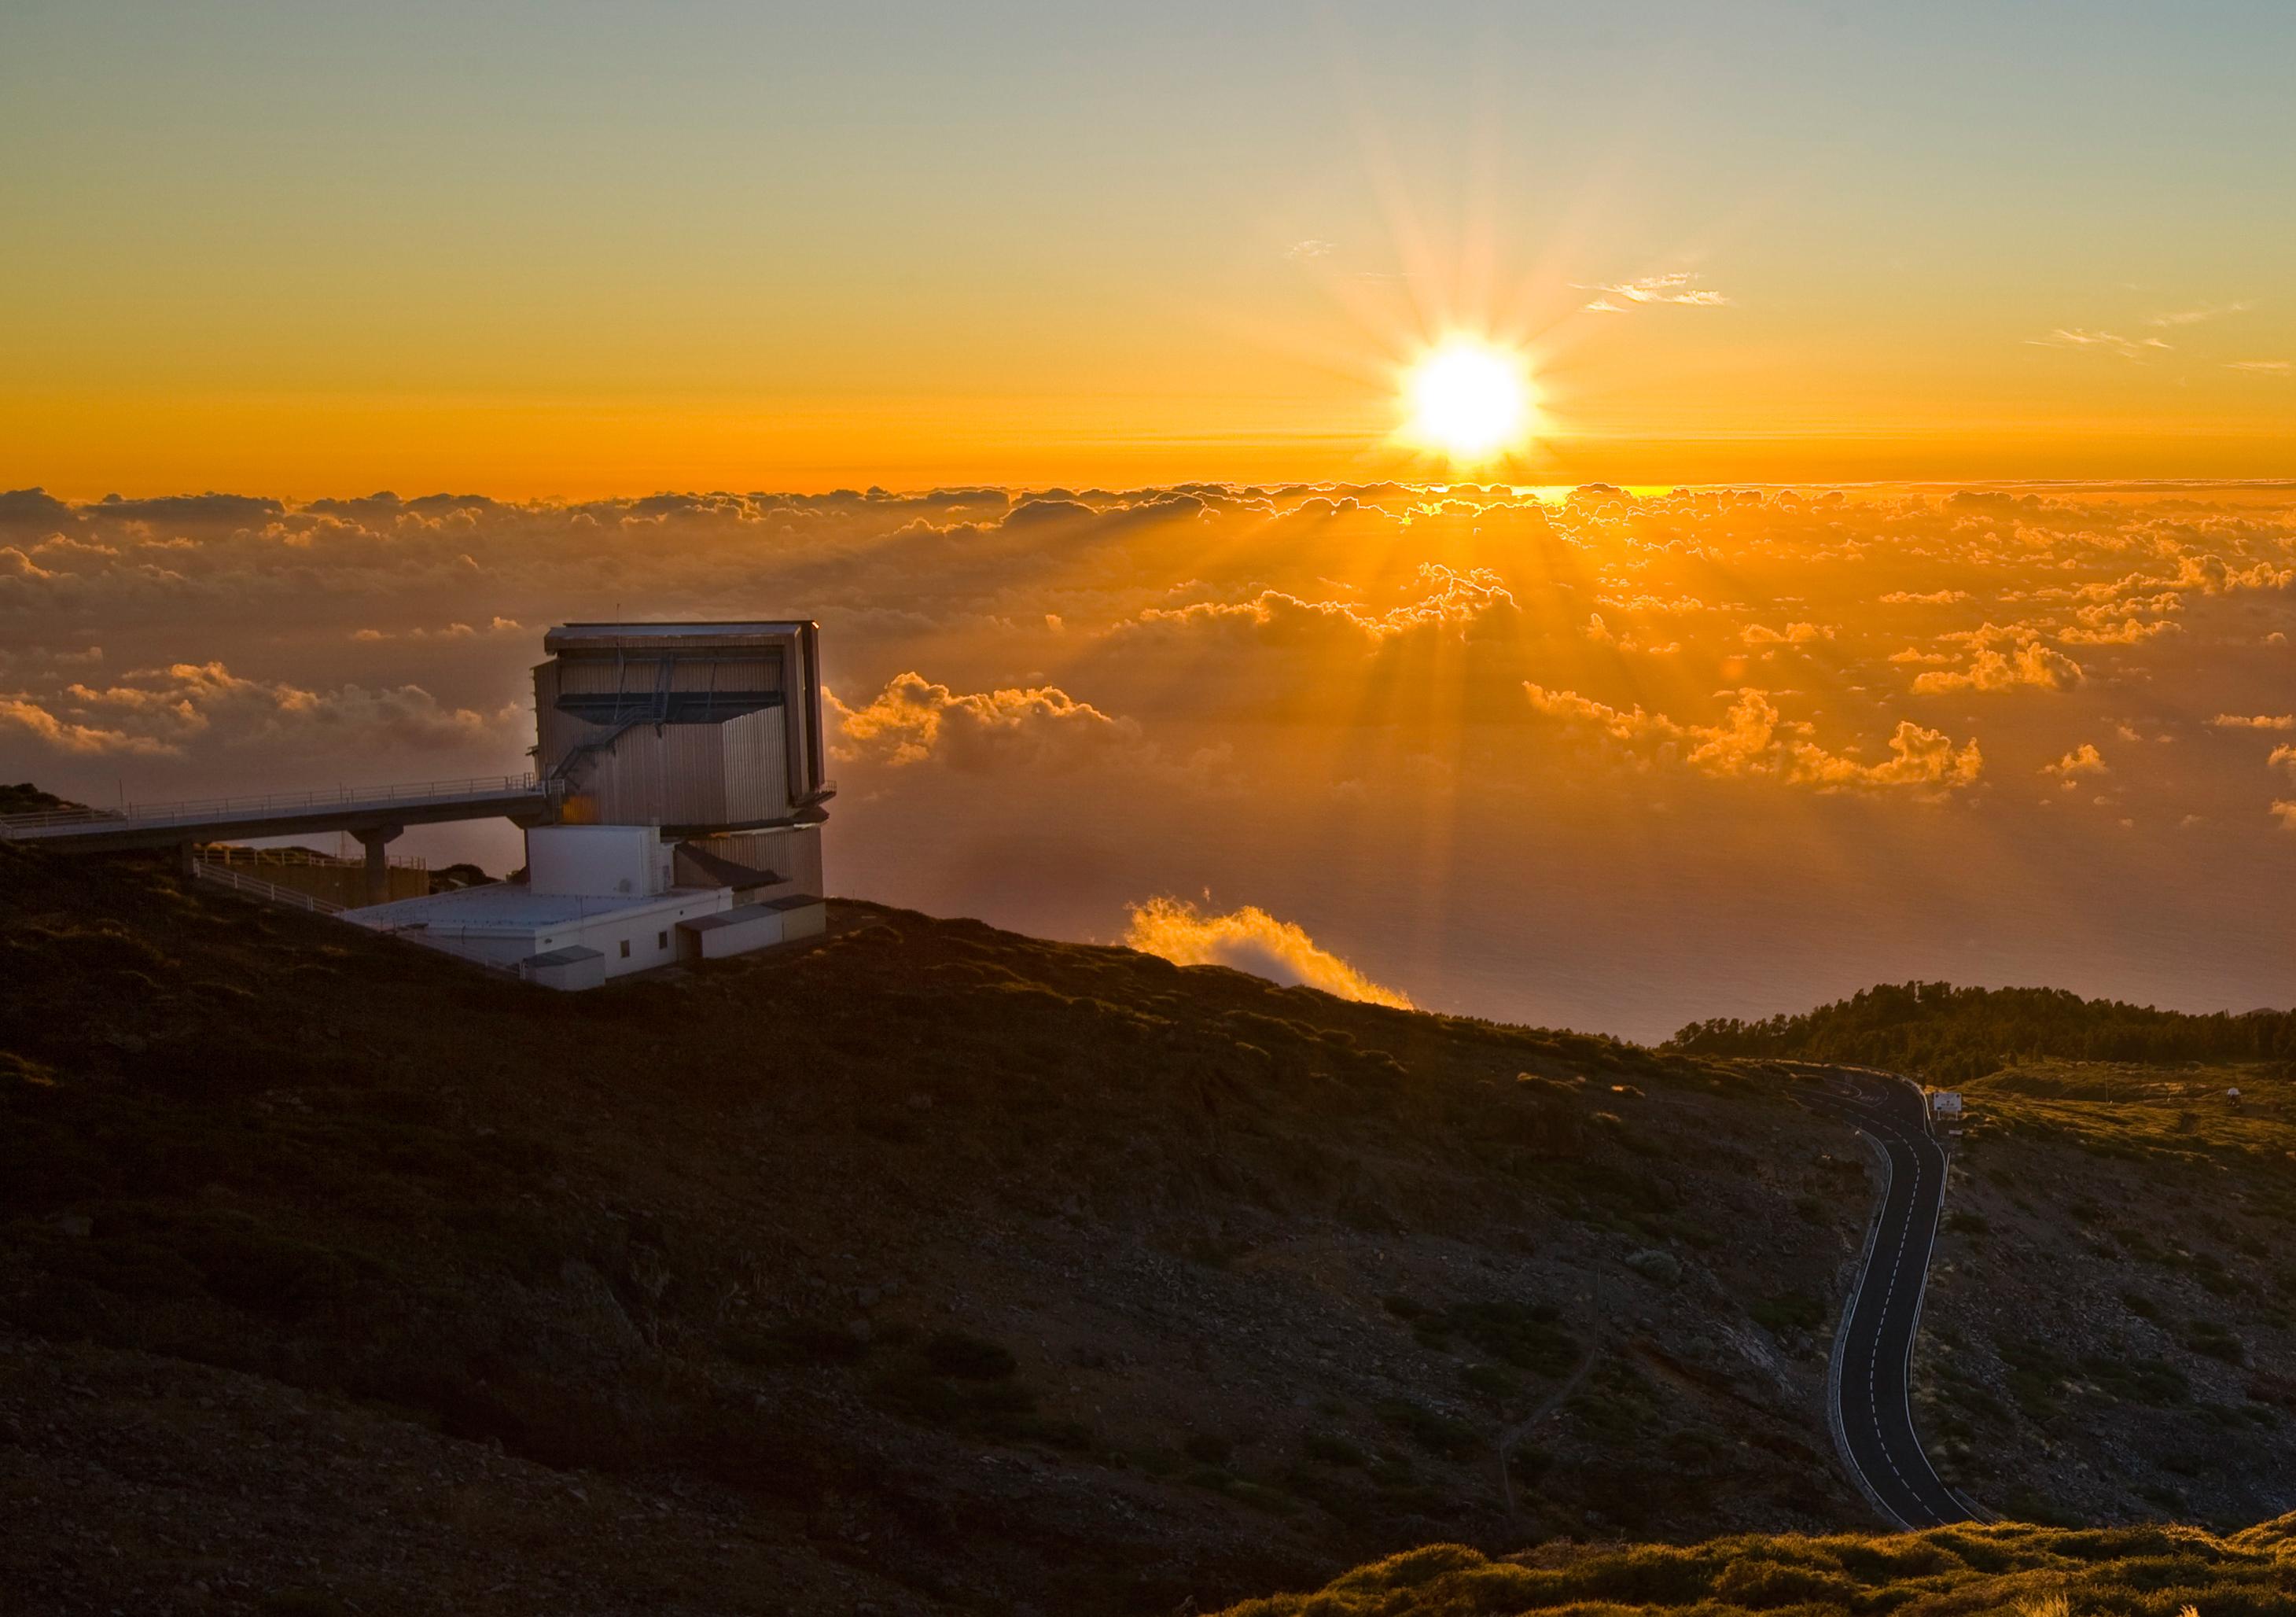 Das Telescopio Nazionale Galileo (TNG) des italienischen Istituto Nazionale di Astrofisica (INAF) auf der Kanareninsel La Palma. Bild: © INAF-TNG